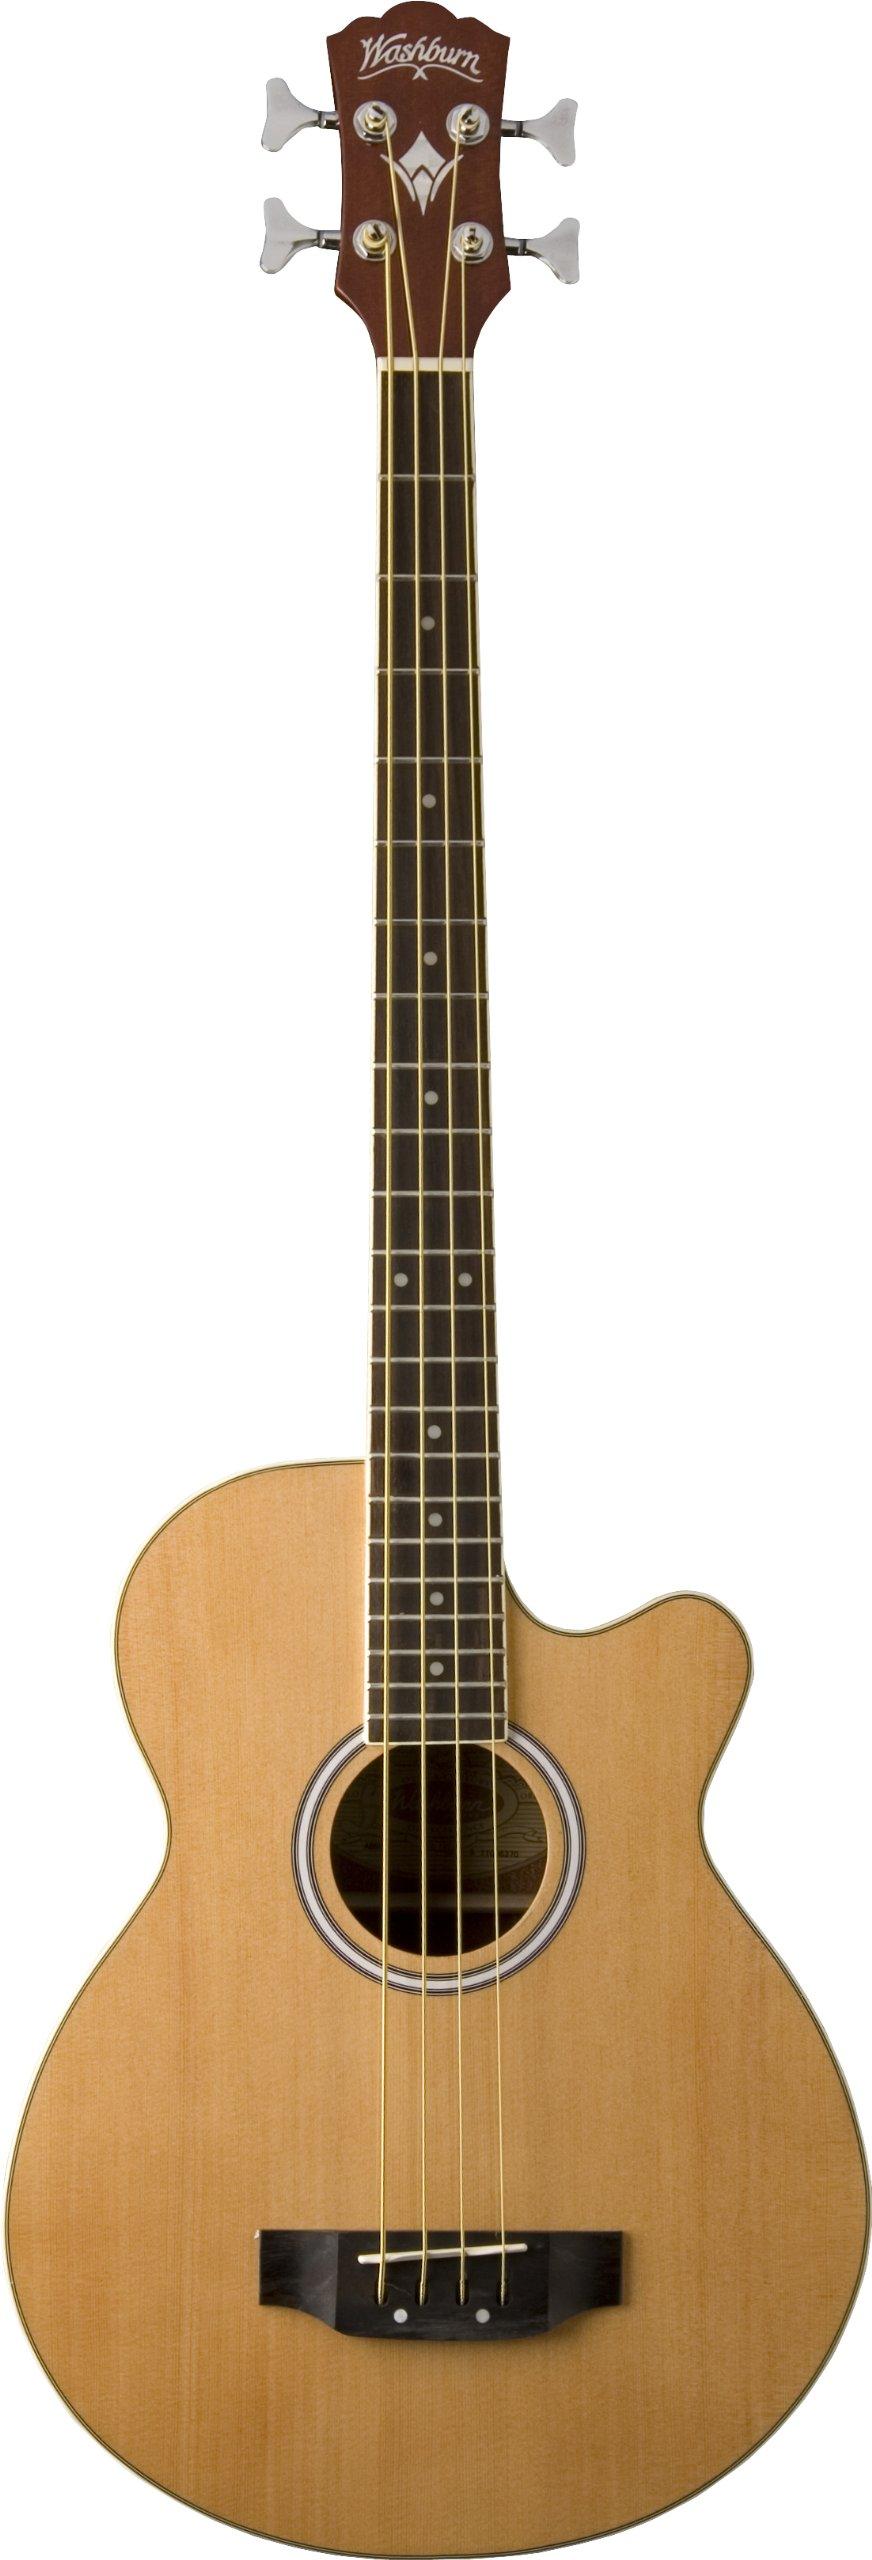 Washburn Acoustic Basses AB5K Acoustic Bass, Natural